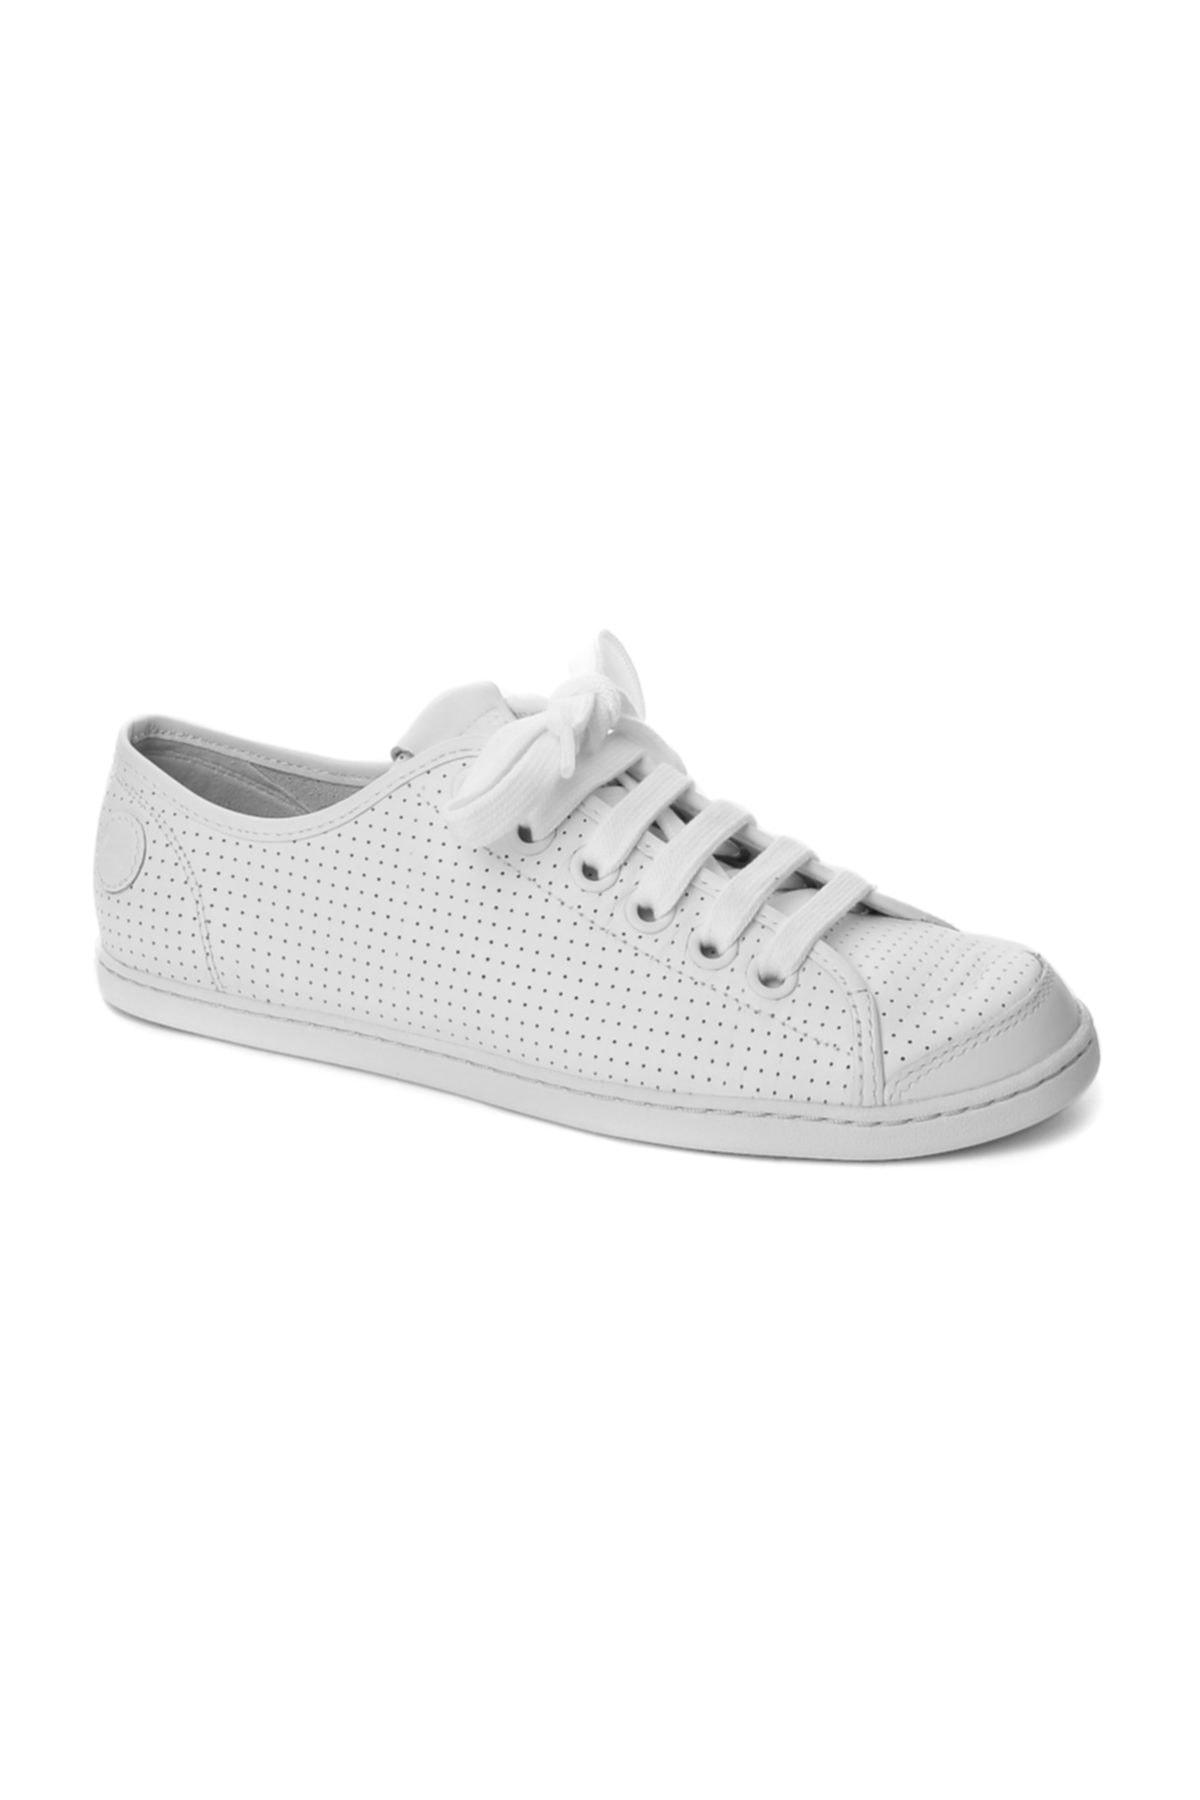 CAMPER Kadın  Sneaker 21815-046 1